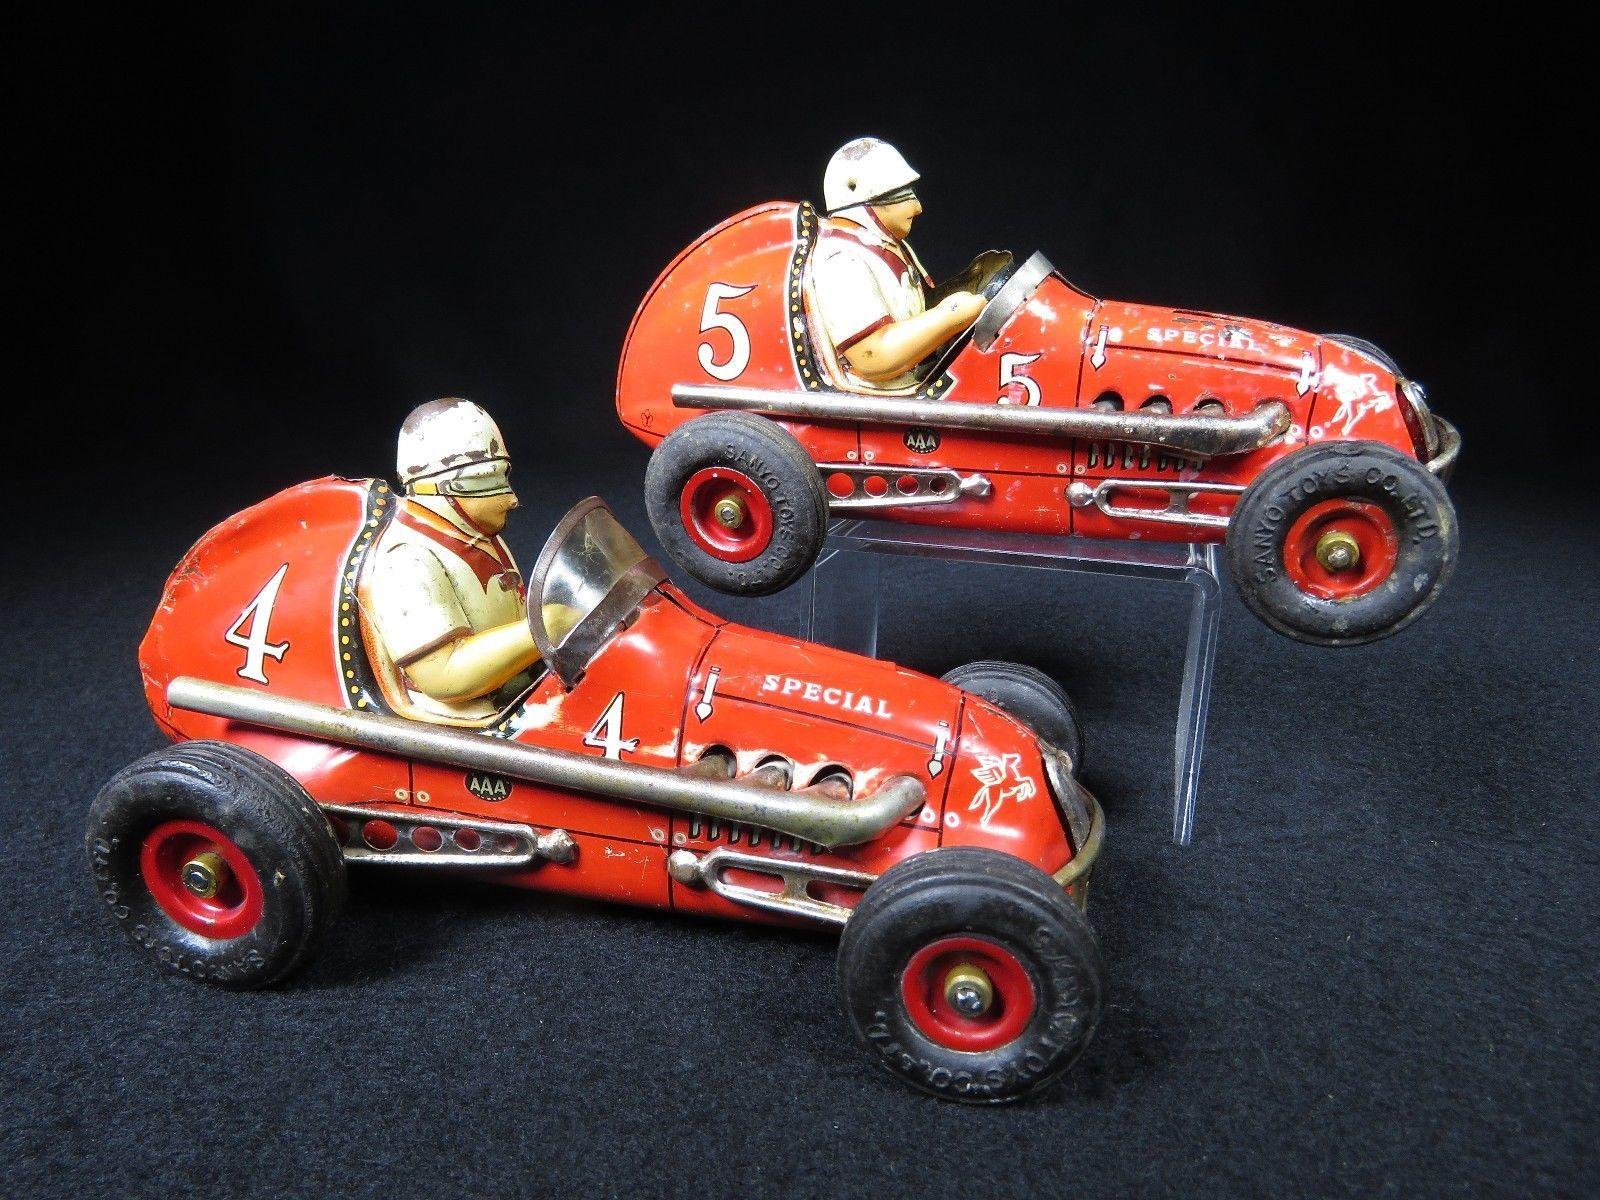 RARE PAIR of 2 INDY SPECIAL MIDGET RACE CAR TIN FRICTION E ...